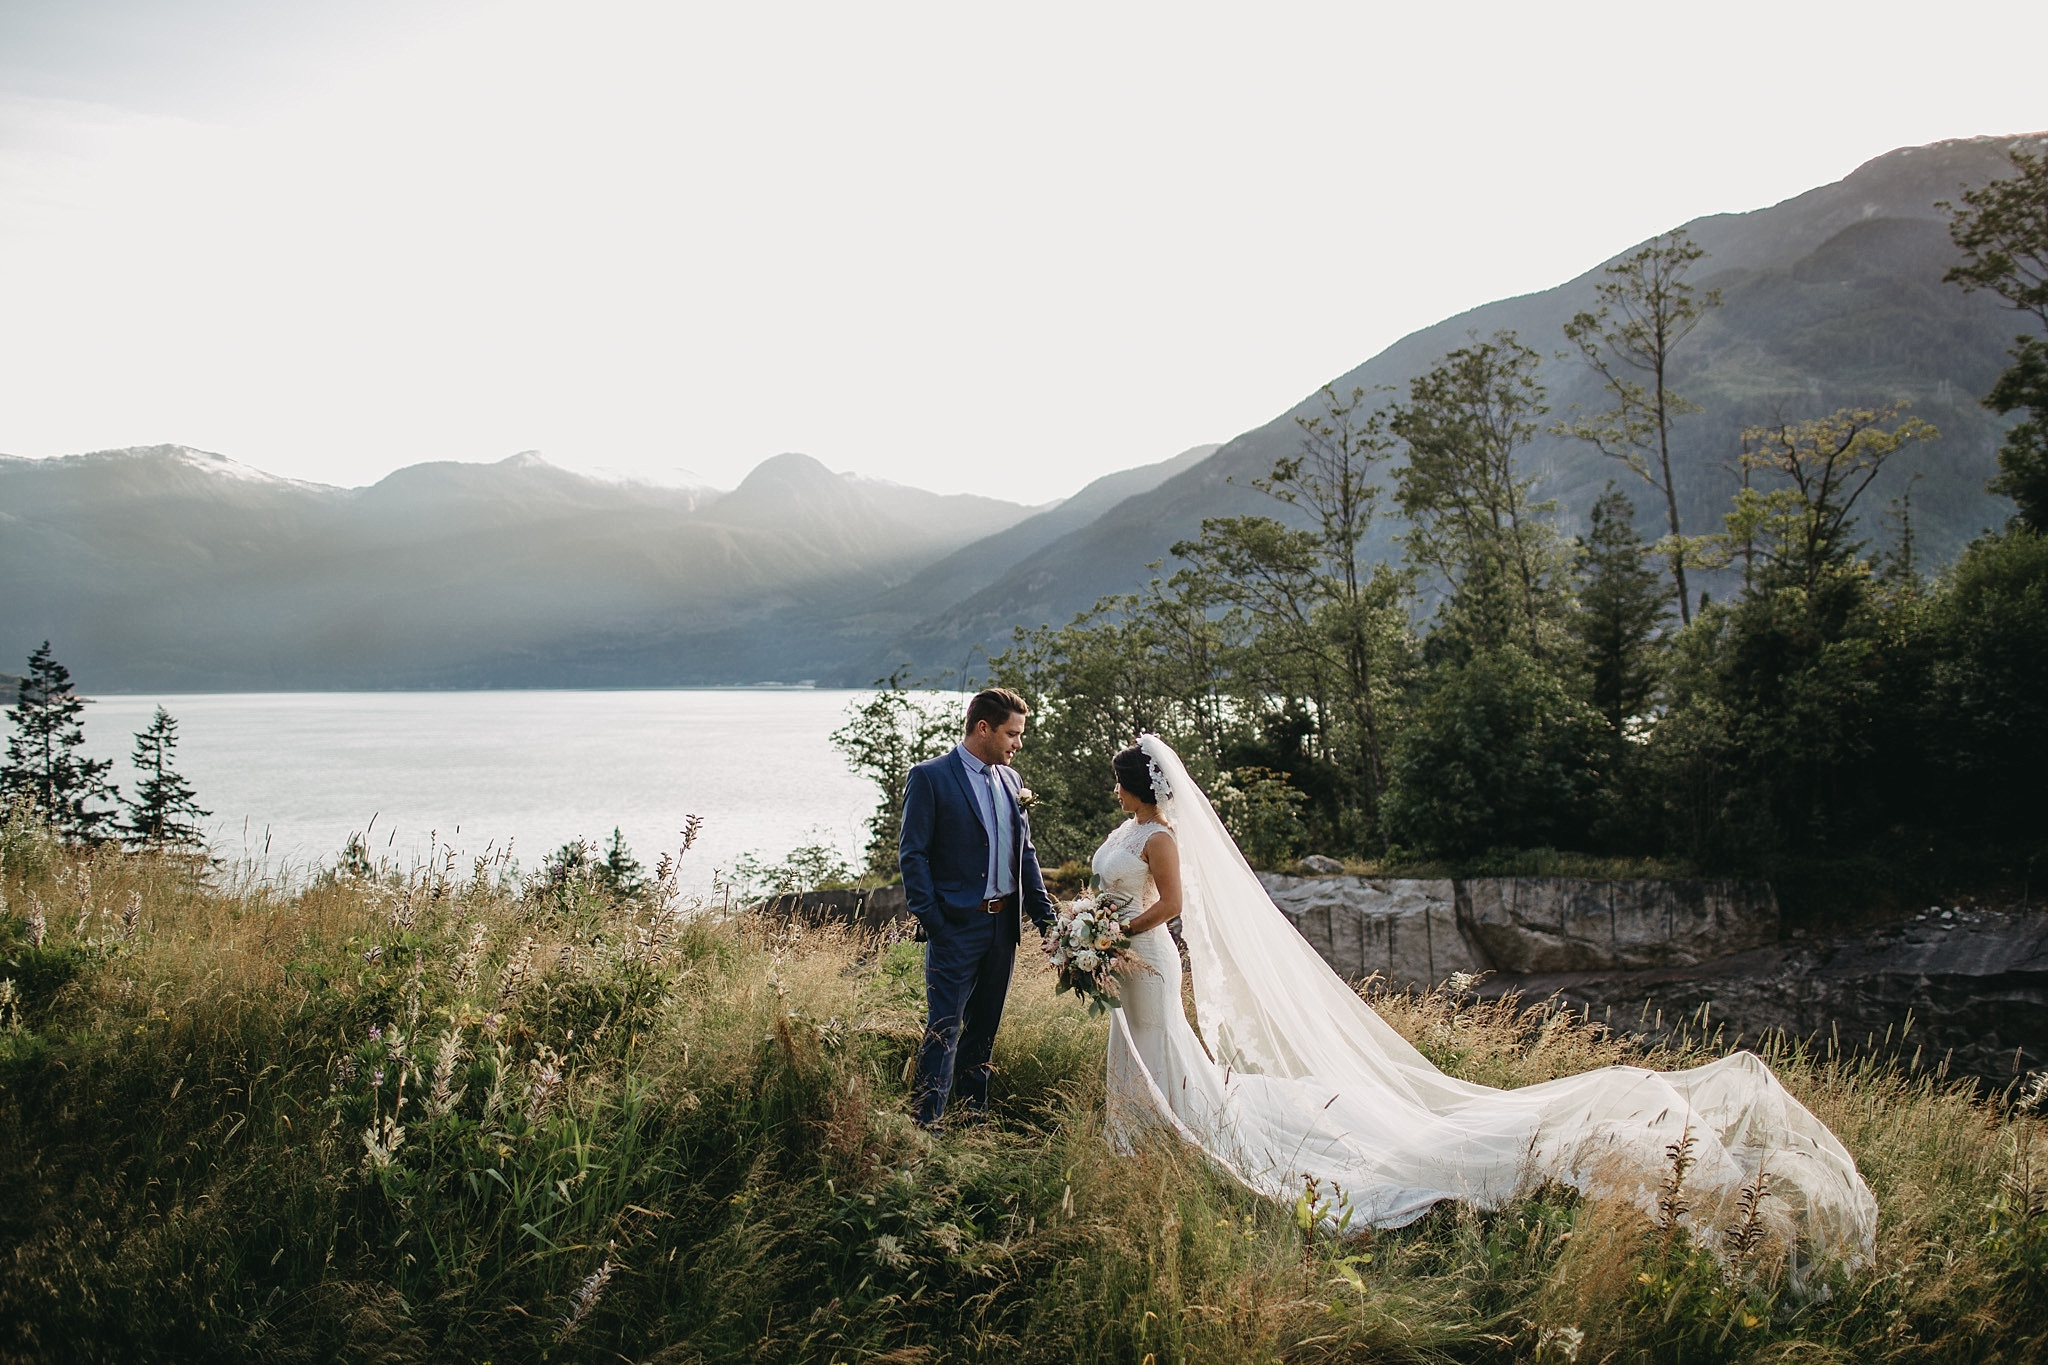 aileen-choi-photo-hart-house-wedding_0108.jpg